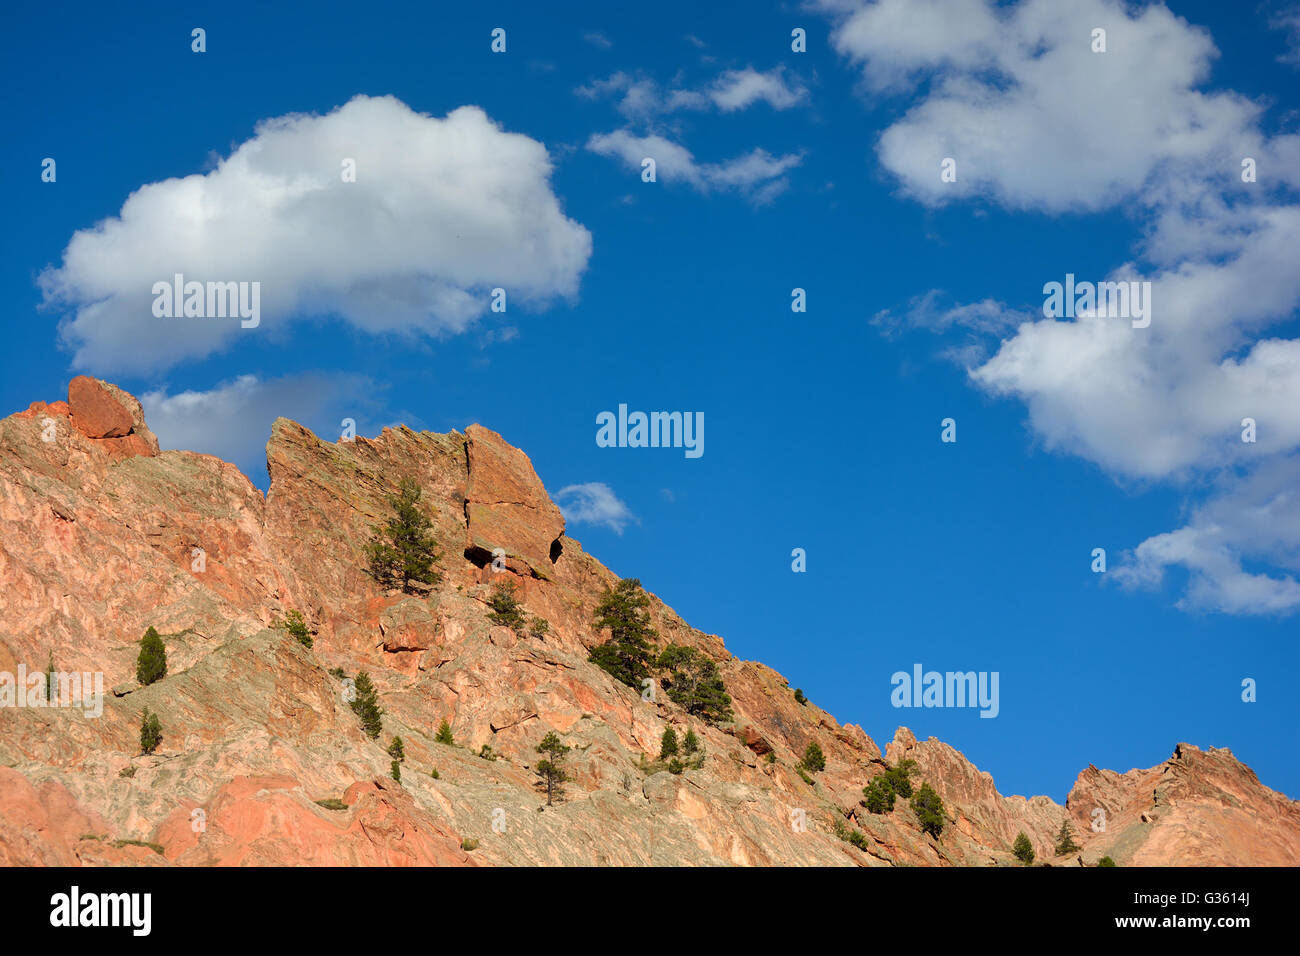 Garden of the Gods in Colorado Springs - Stock Image